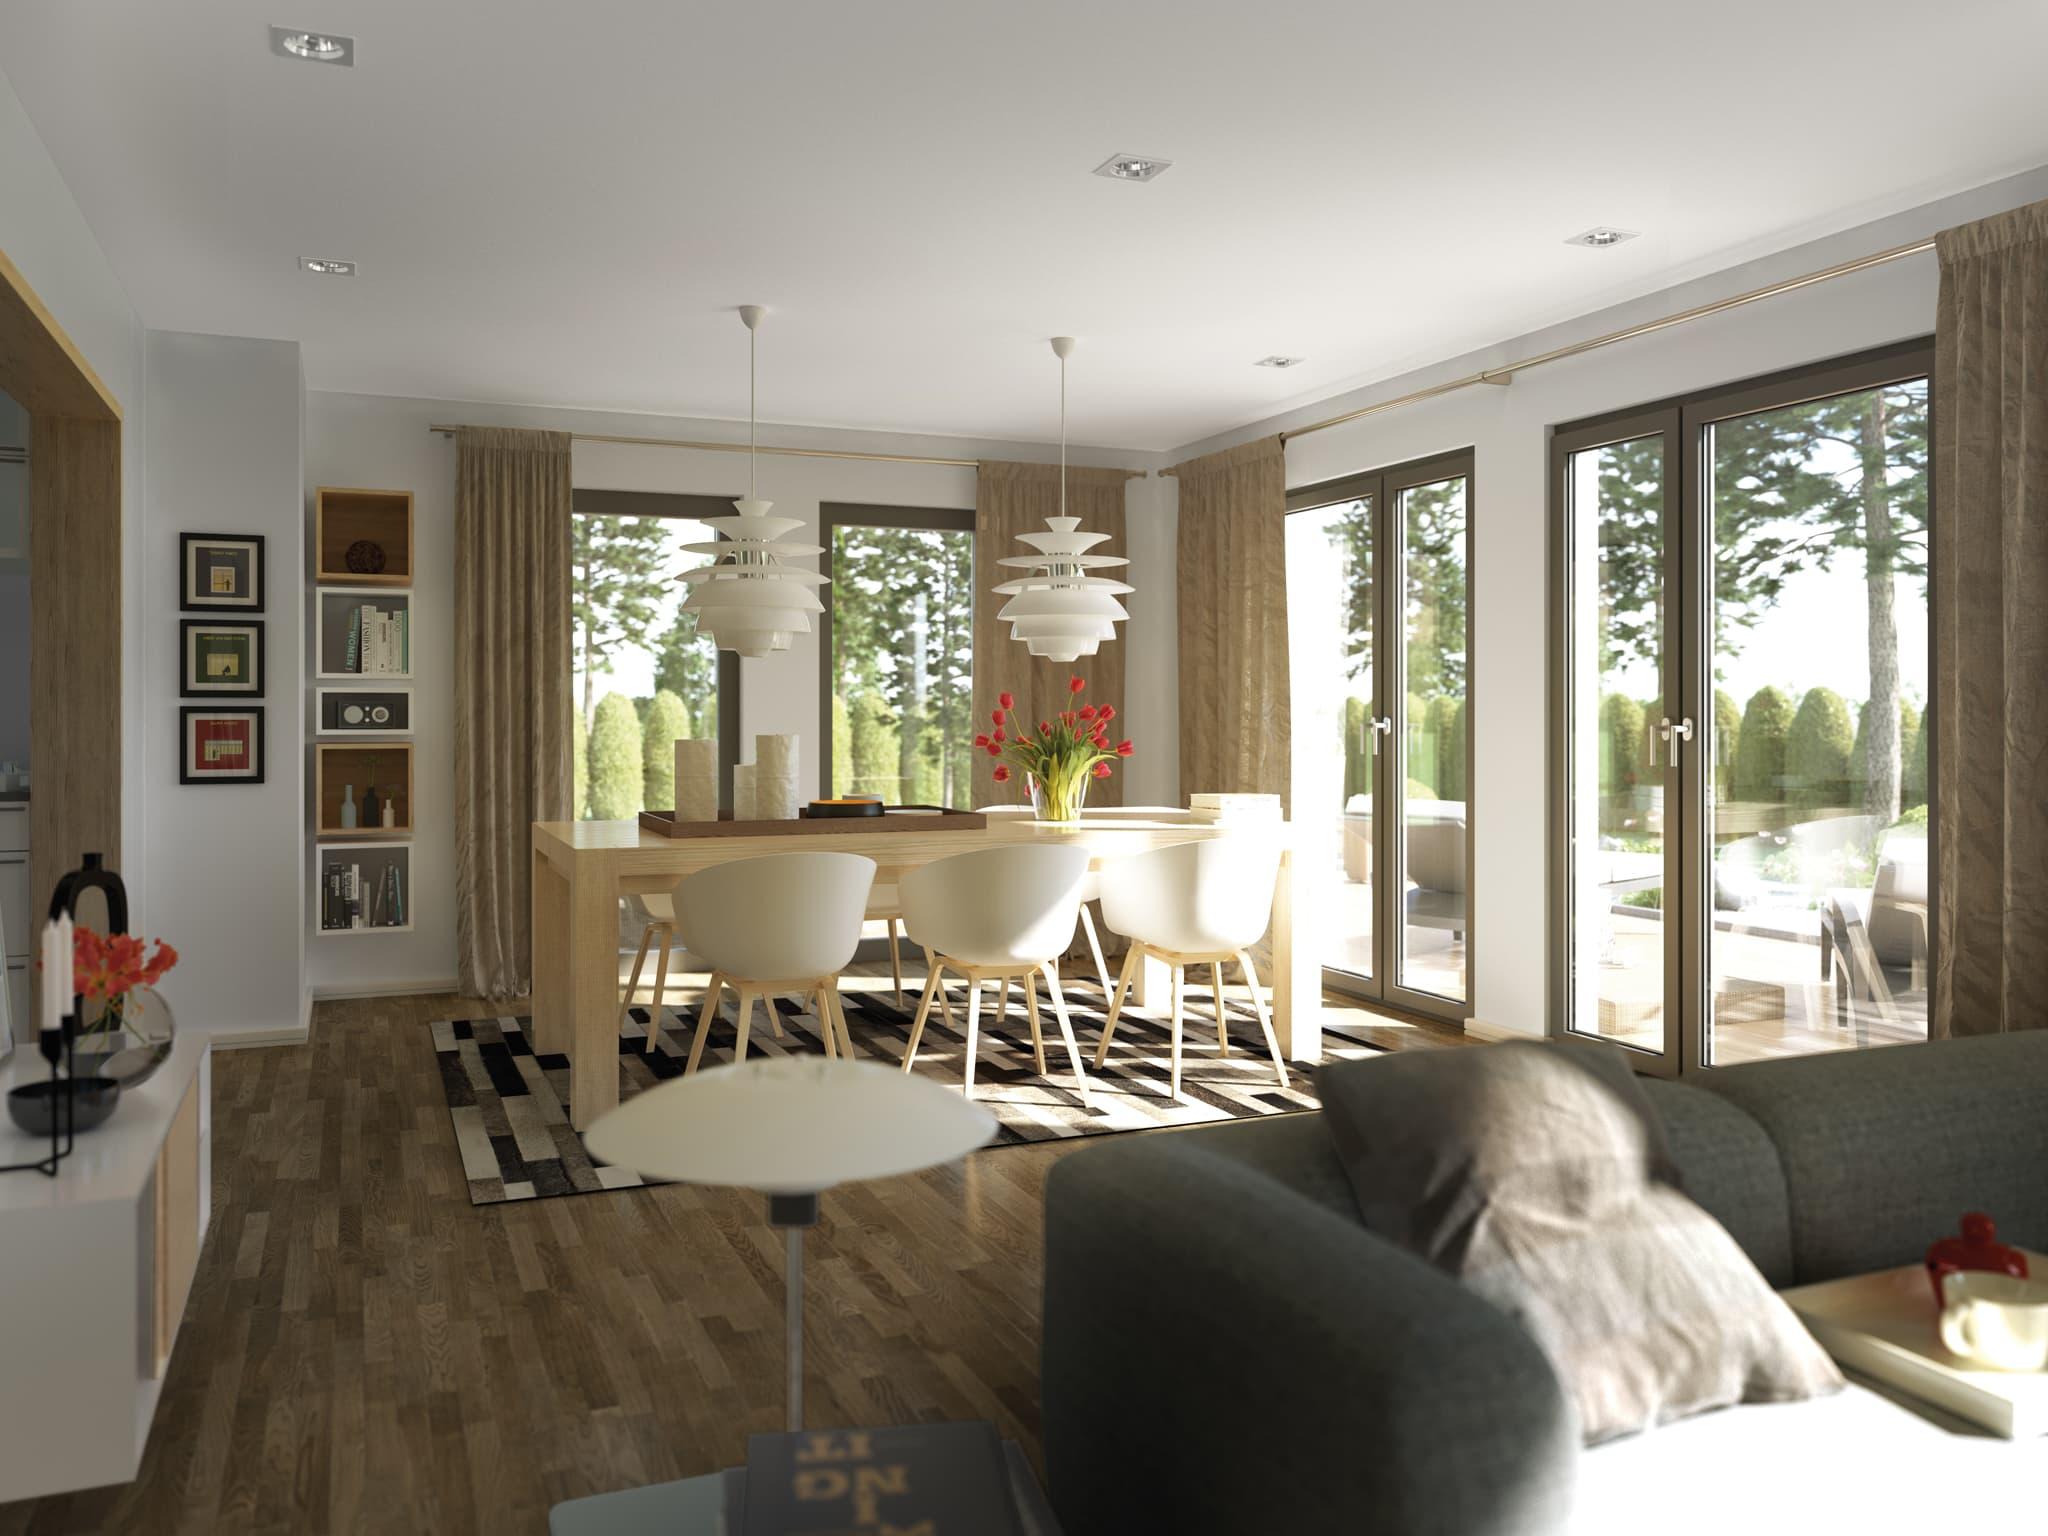 Wohn- Esszimmer Ideen - Einfamilienhaus Inneneinrichtung Fertighaus Living Haus SUNSHINE 125 V7 - HausbauDirekt.de